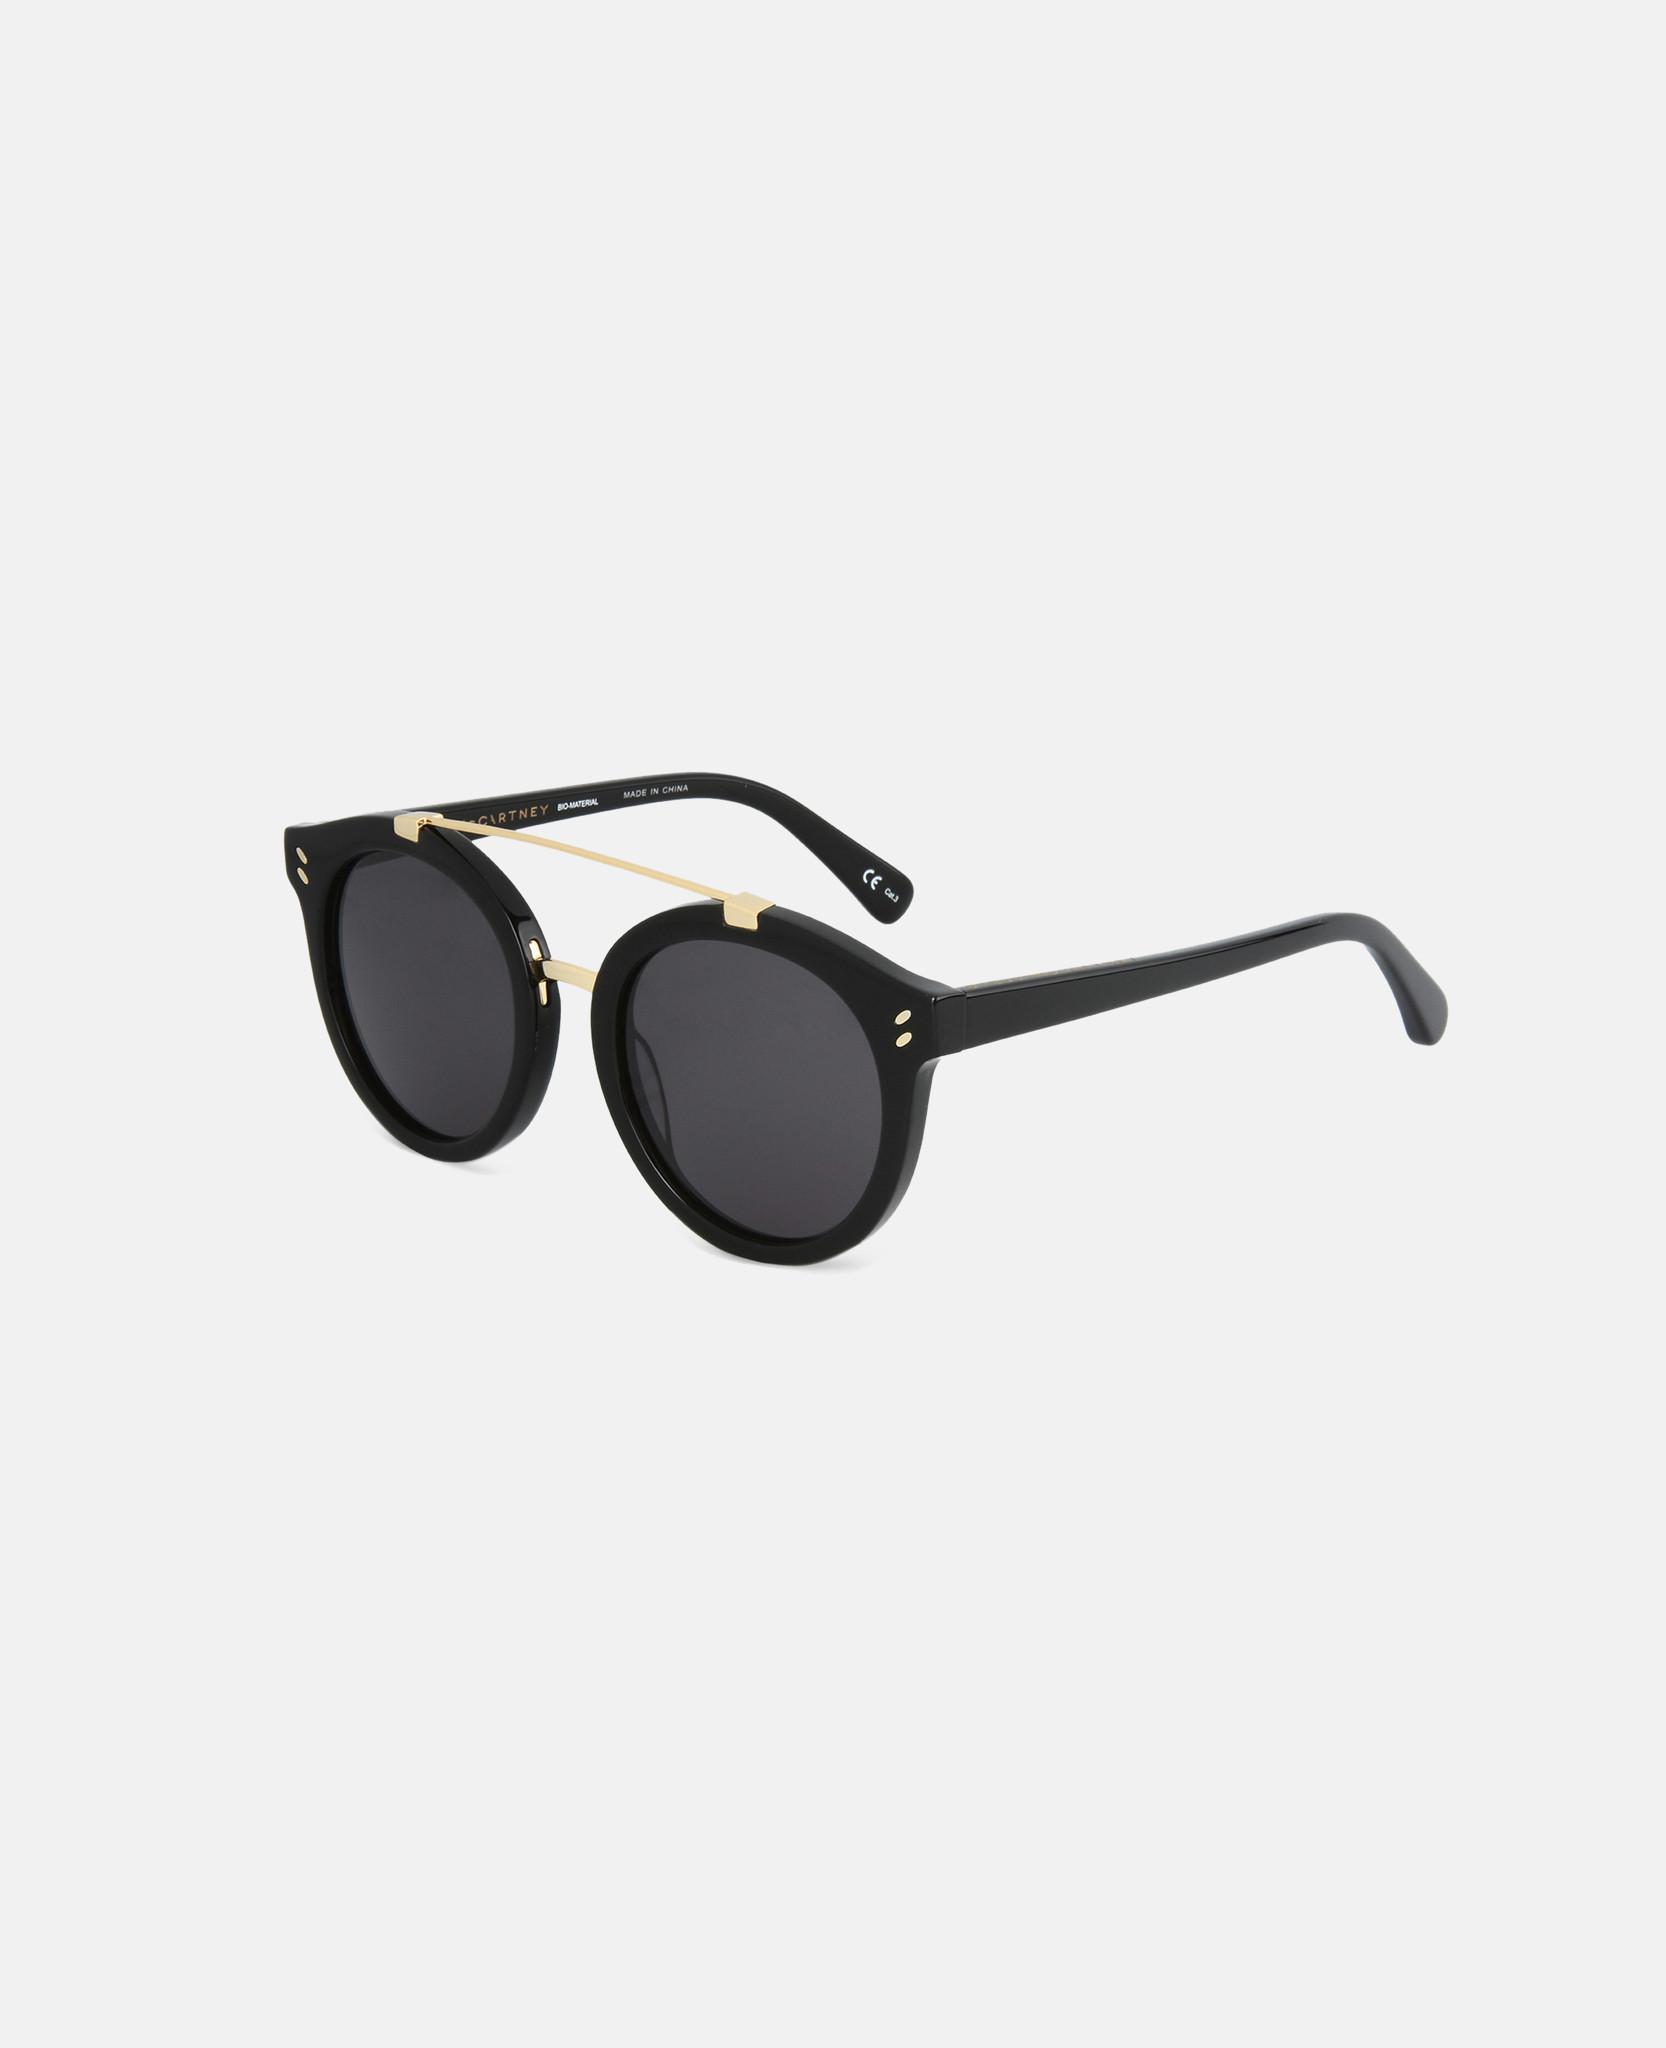 adebba1daa Lyst - Stella McCartney Black Havana Round Frame Sunglasses in Black